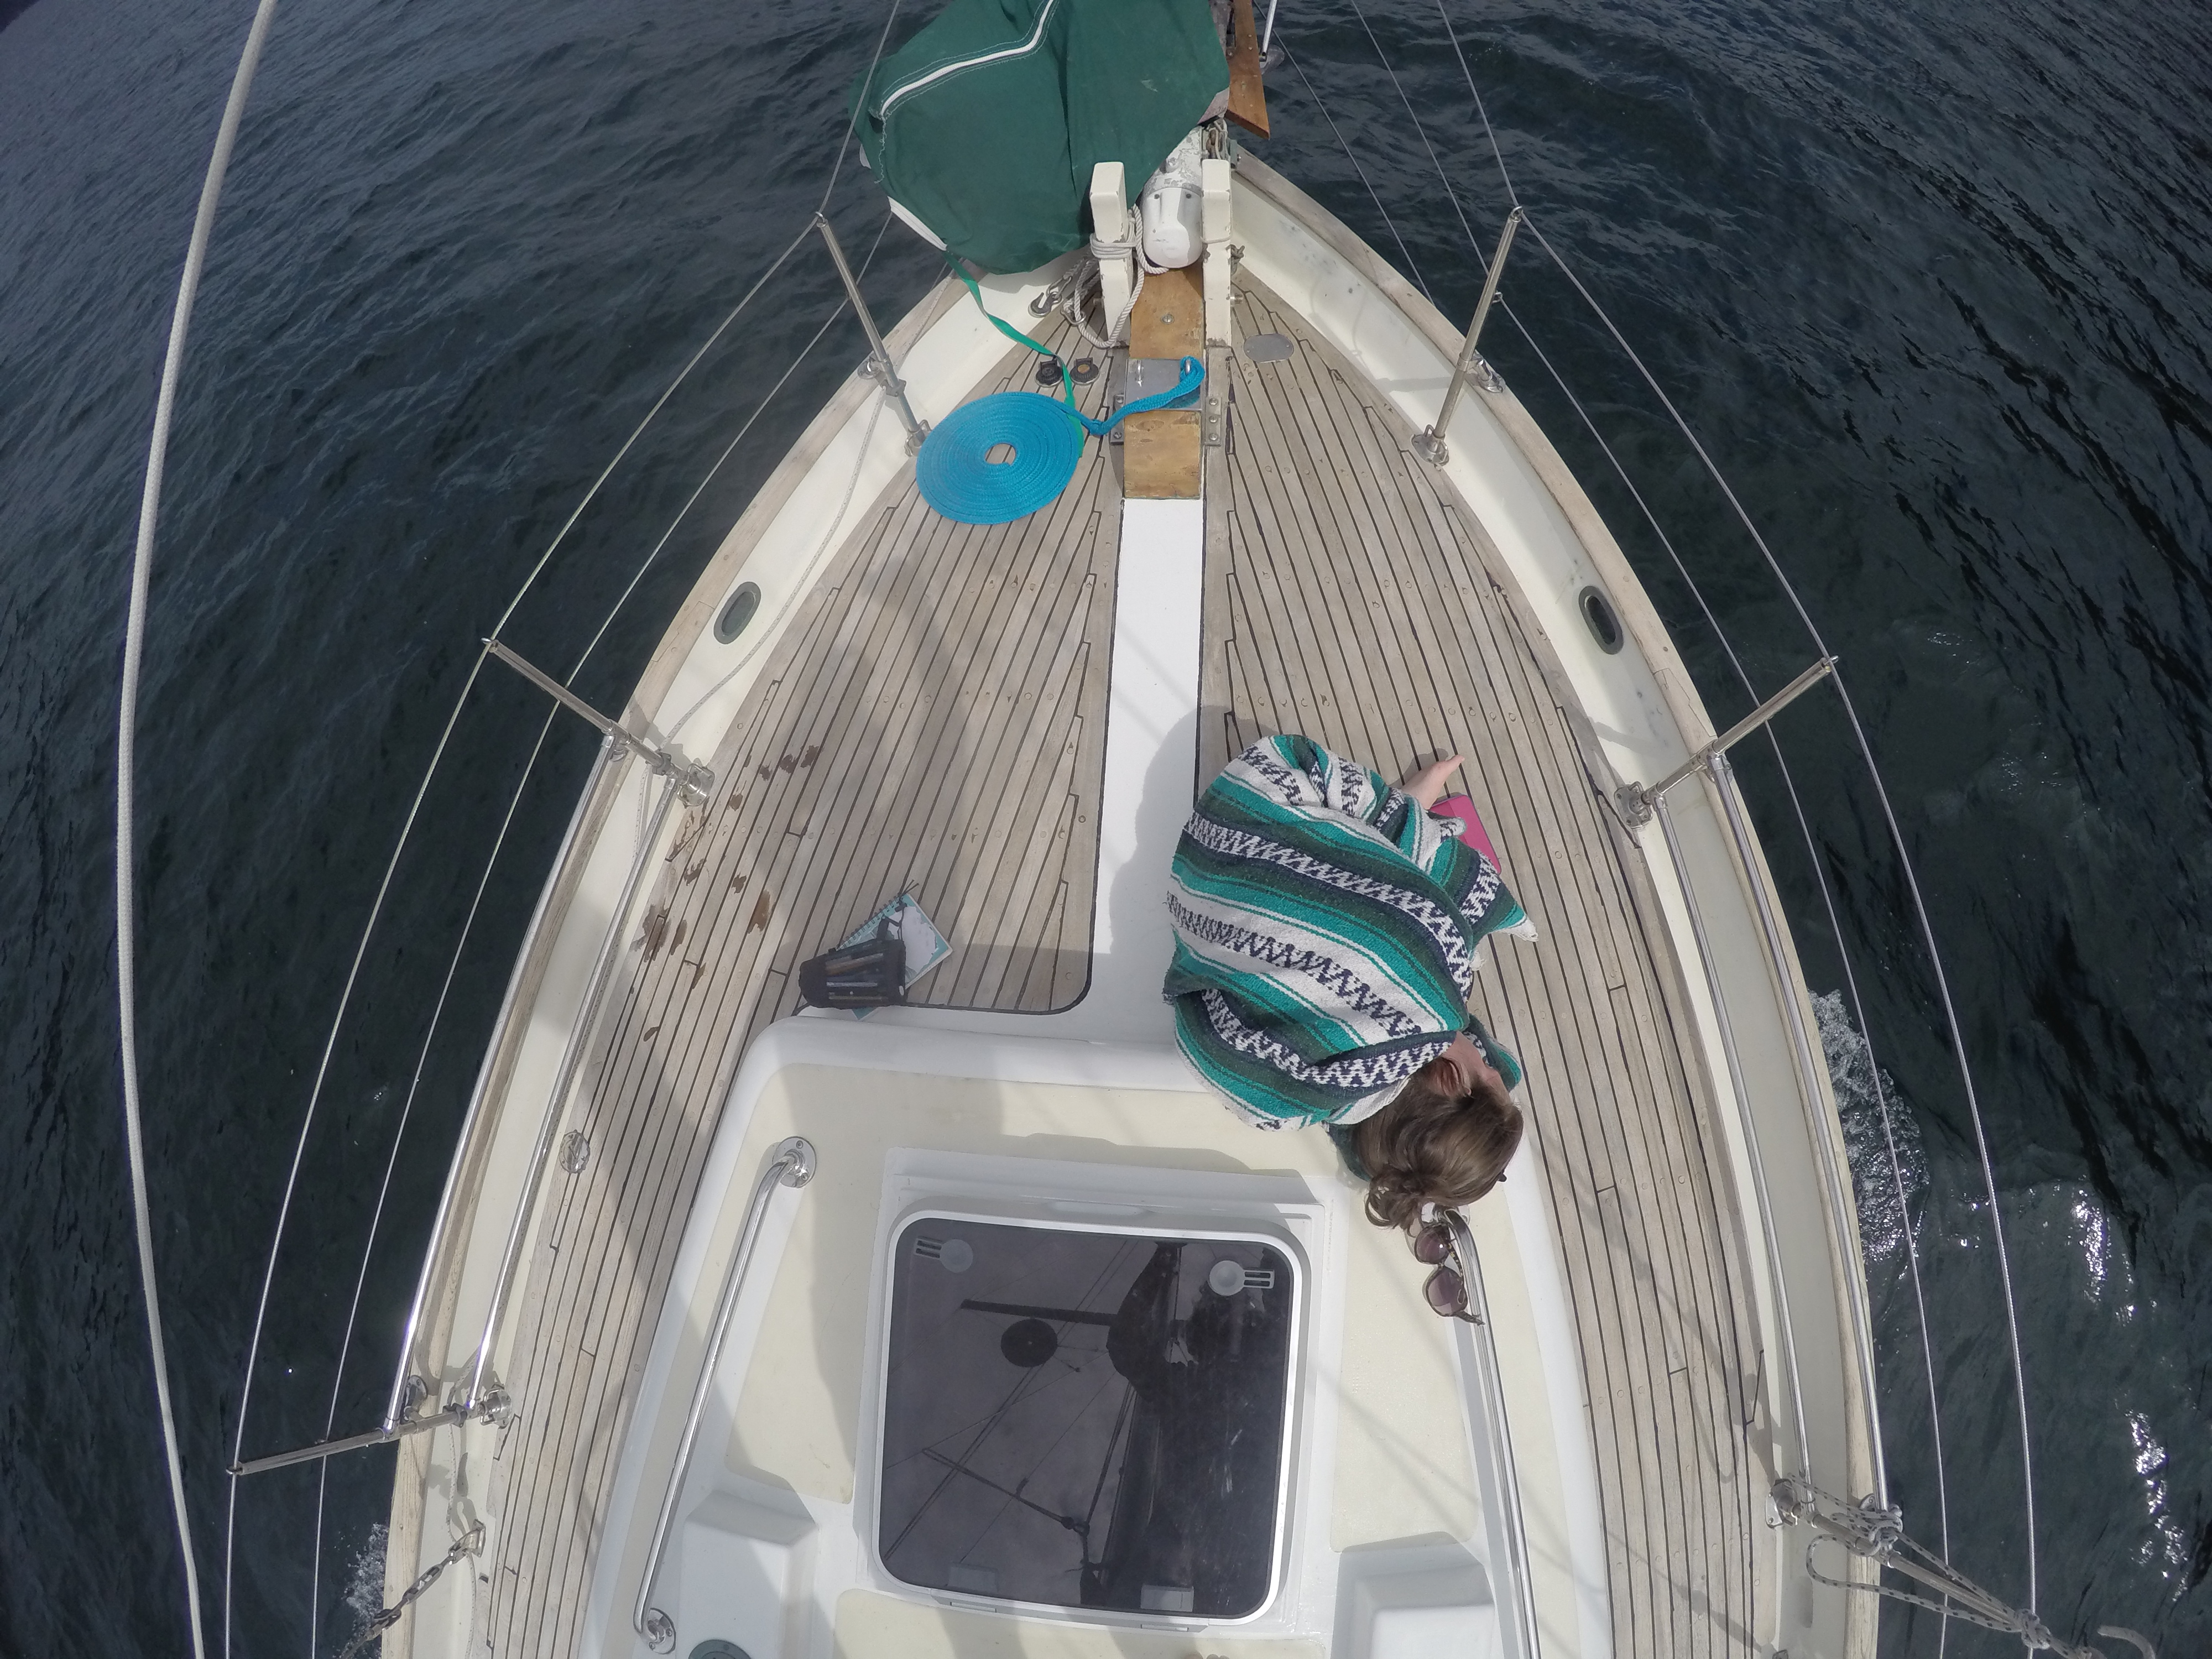 Tamara relaxing on deck of Leela